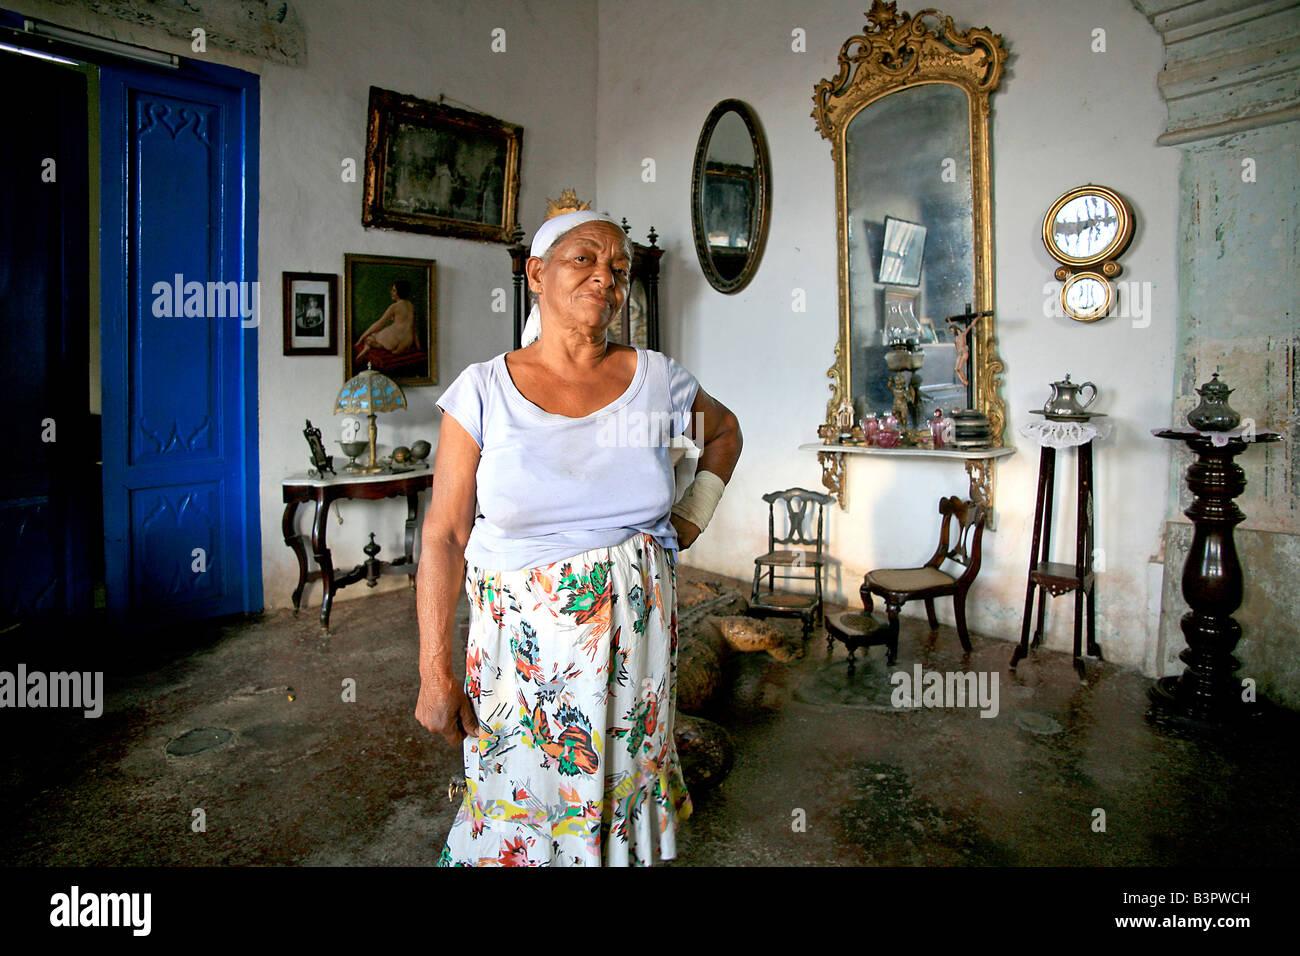 Crocodile house, Trinidad, Cuba, West Indies, Central America Stock Photo